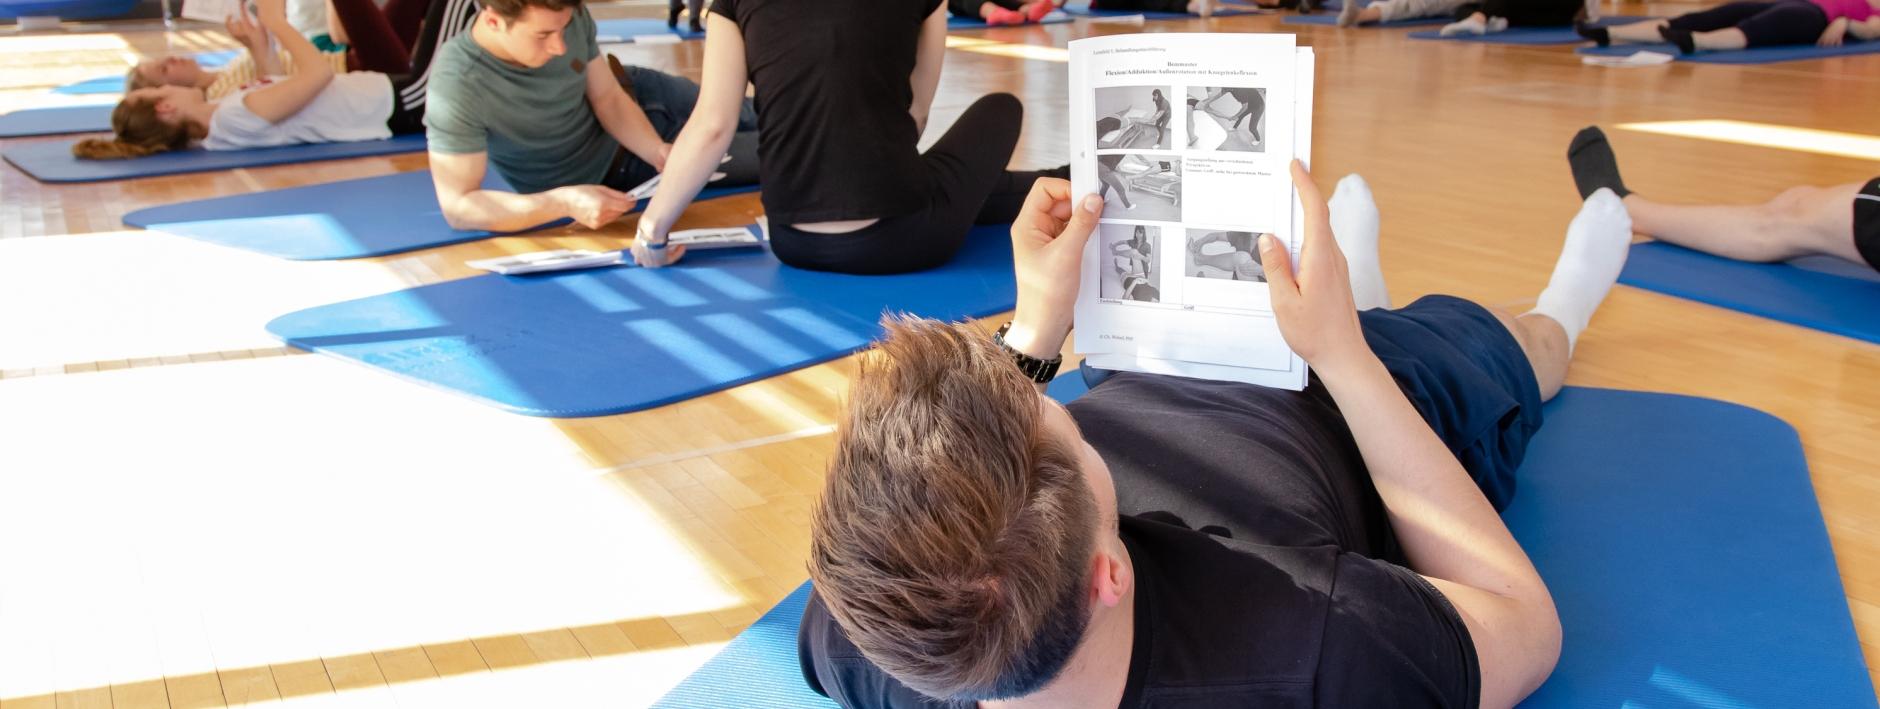 Physiotherapie Studium Berlin